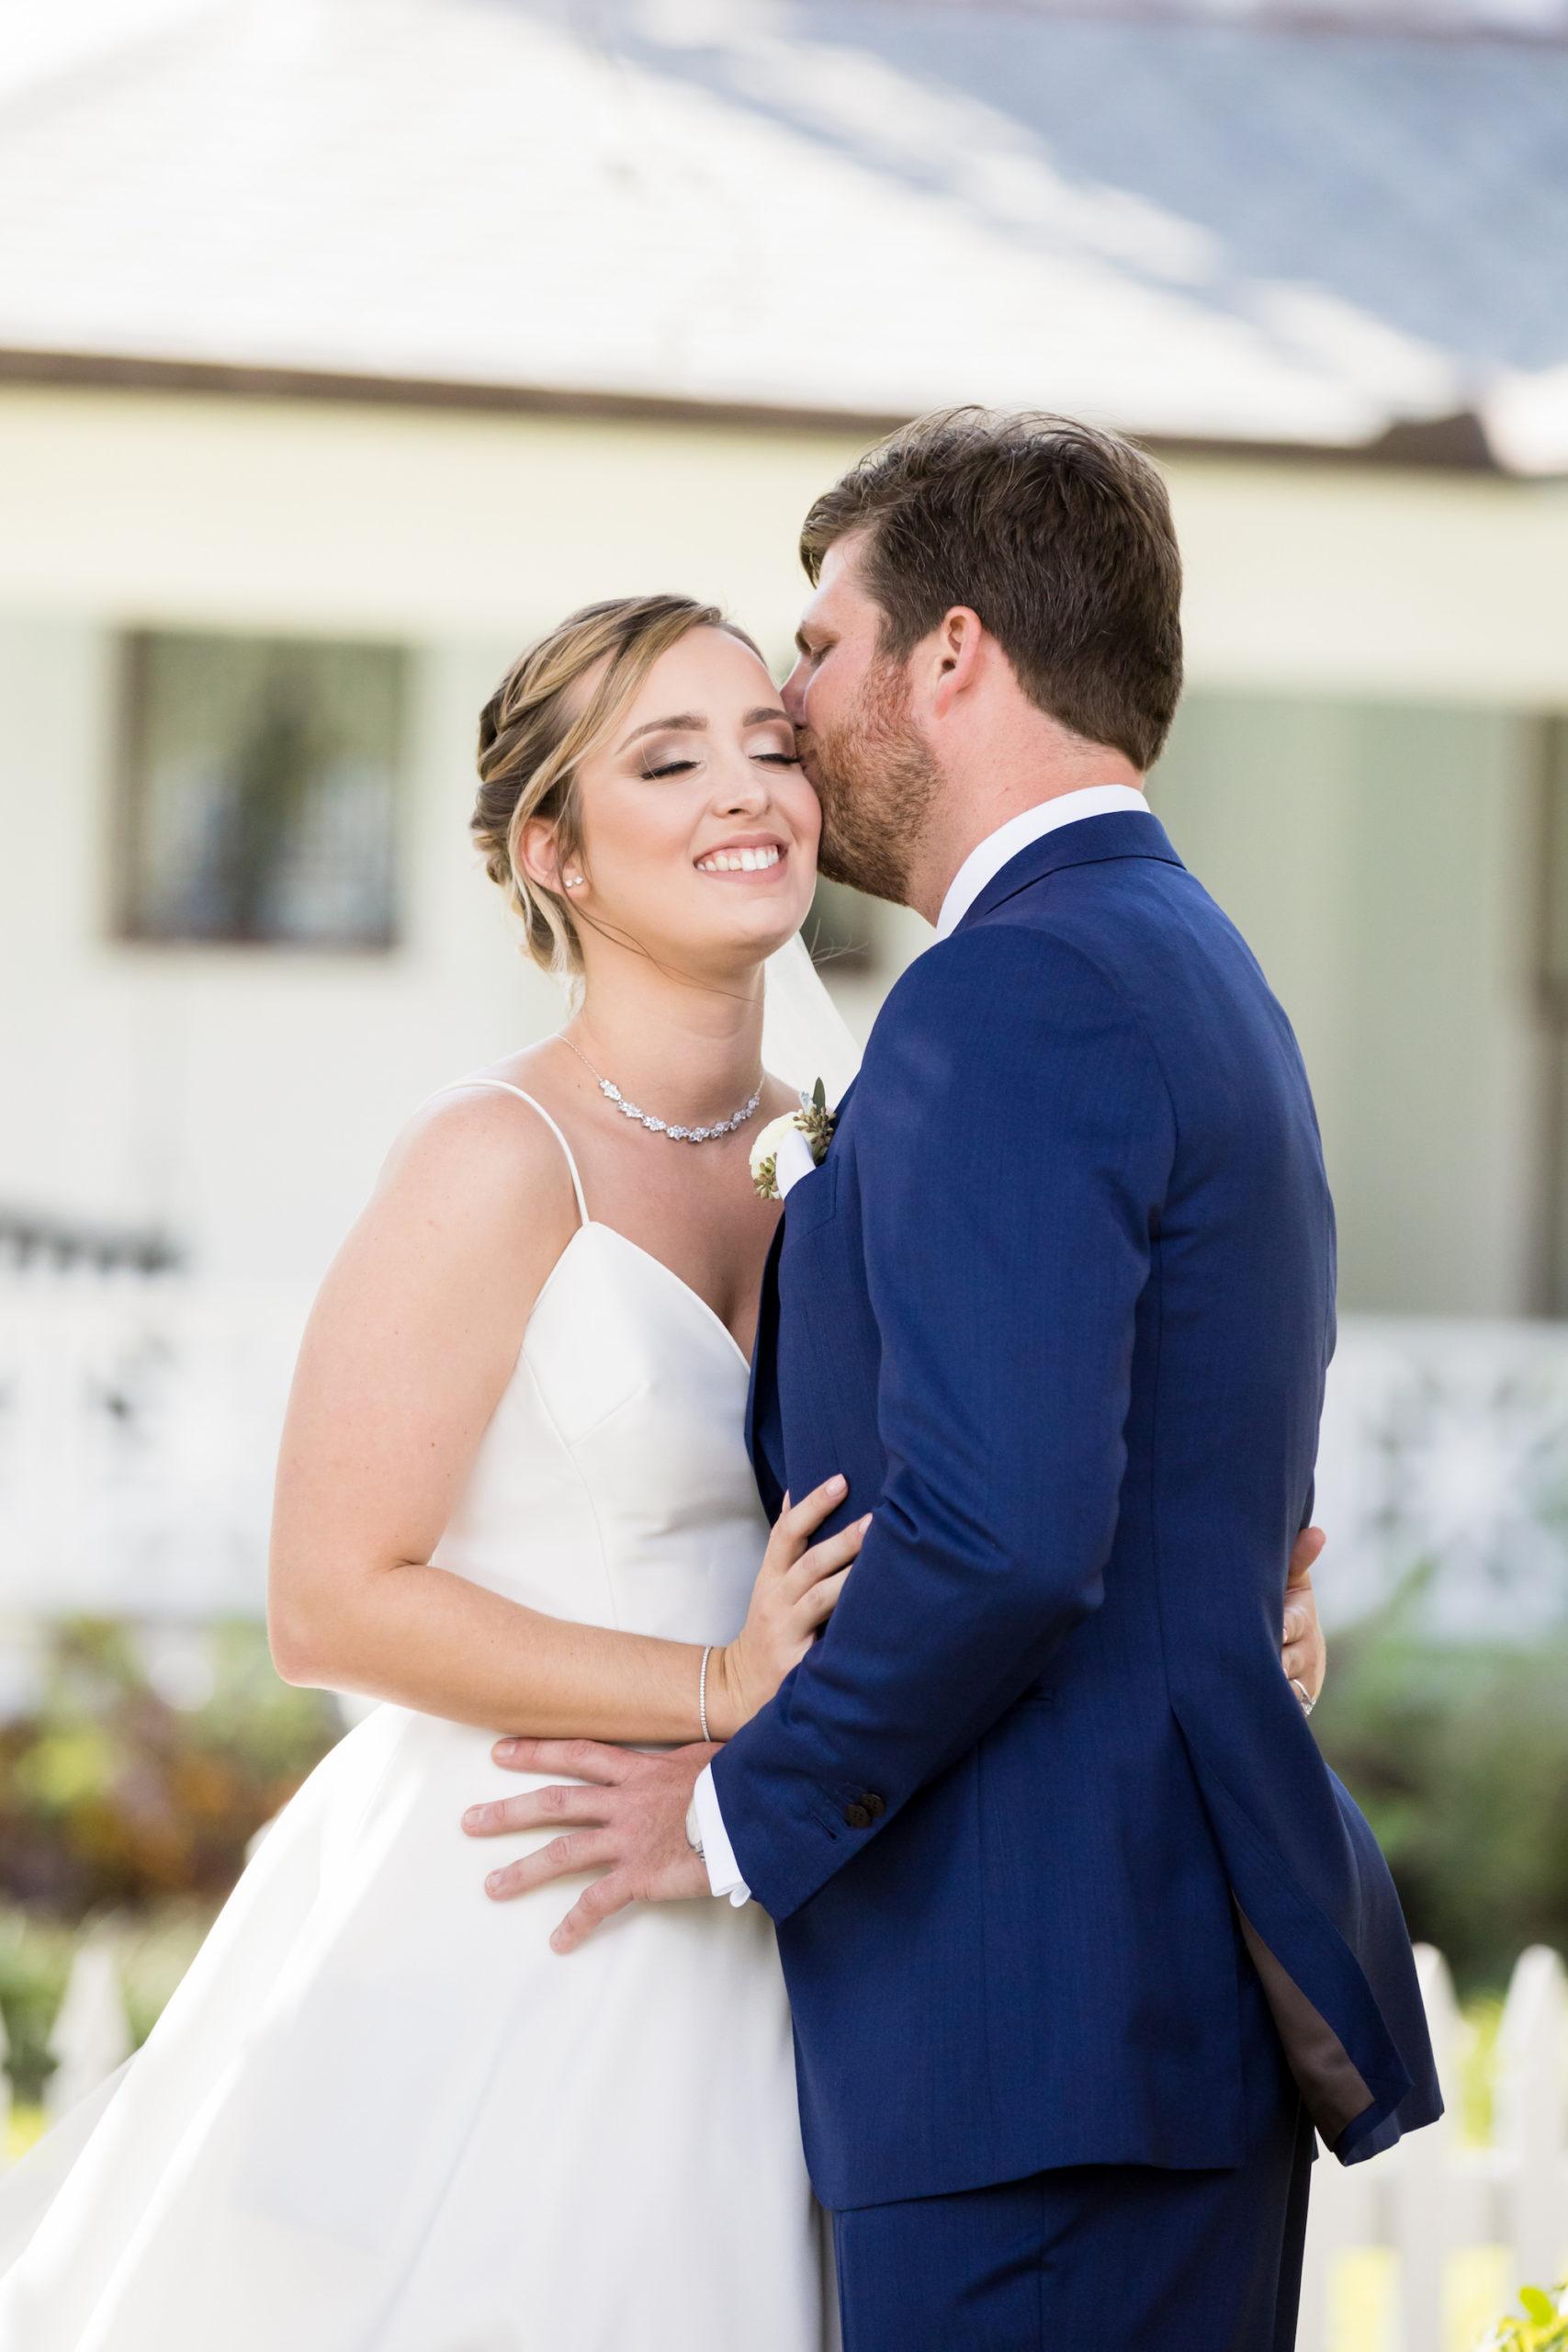 Tampa Bay Romantic Bride and Groom Wedding Portrait